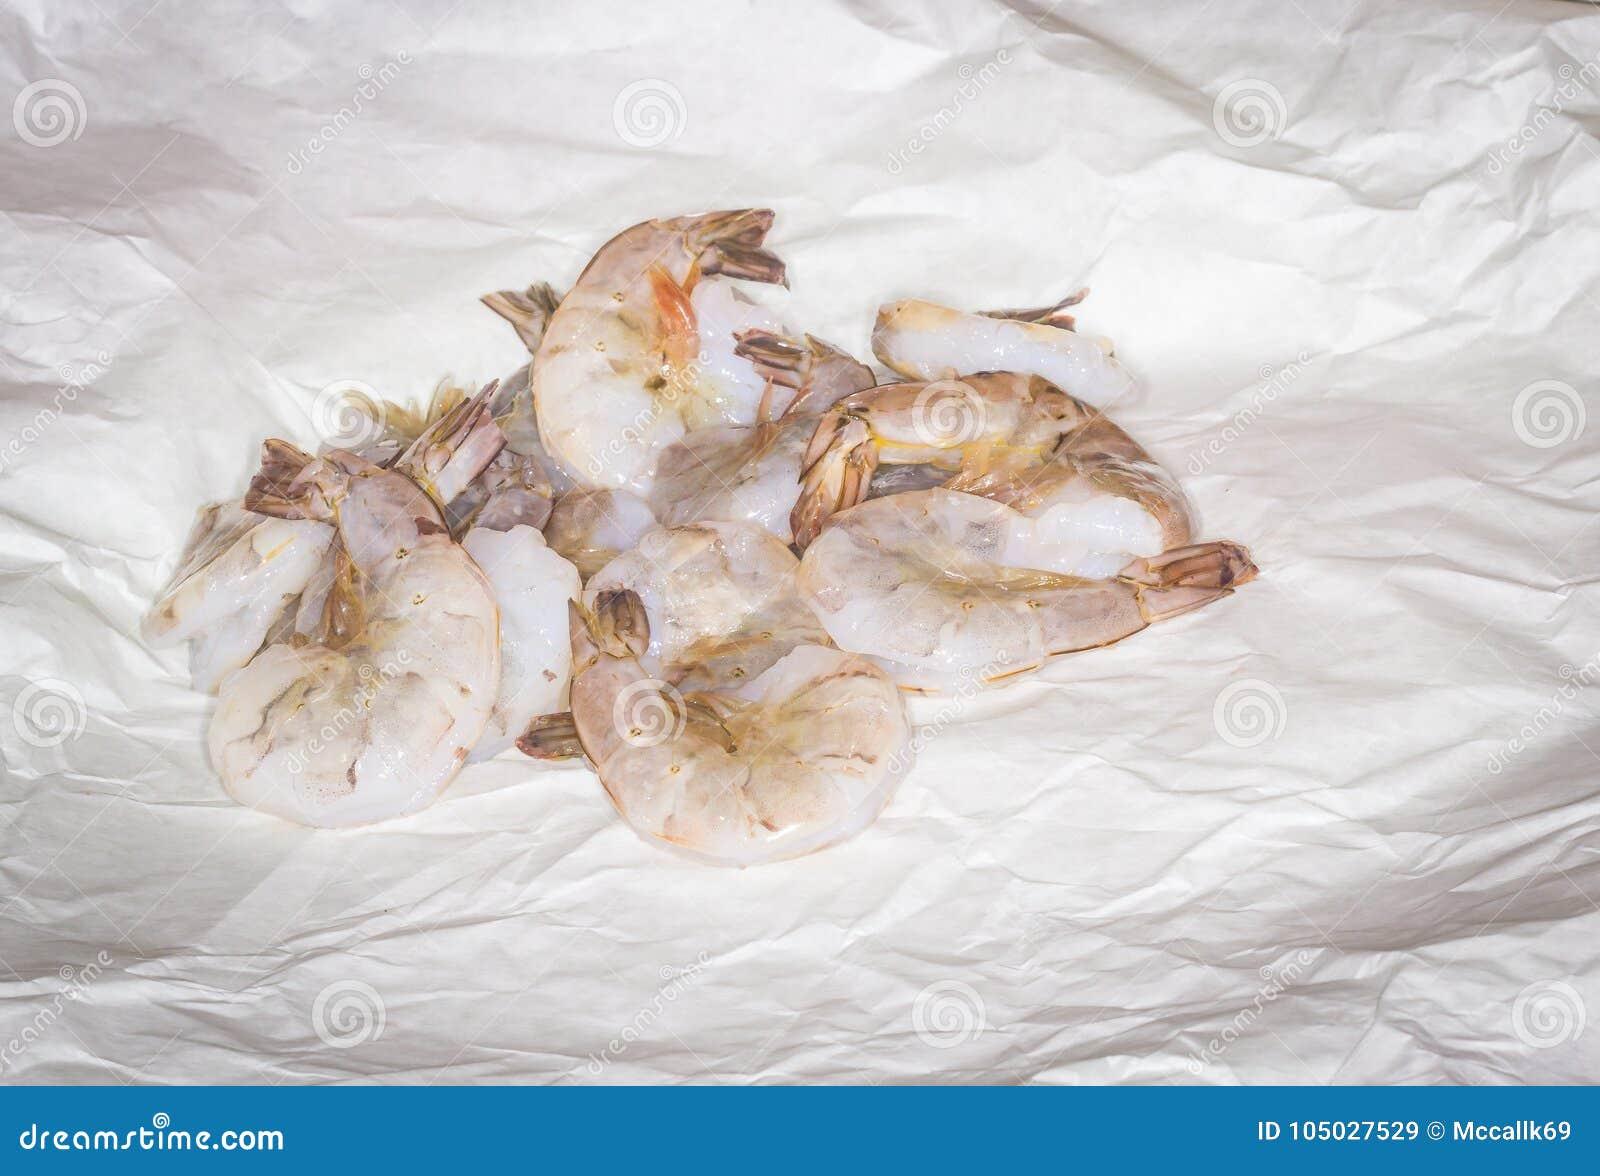 Raw Jumbo Shrimp On Wax Paper Stock Image Image Of Shrimp Paper